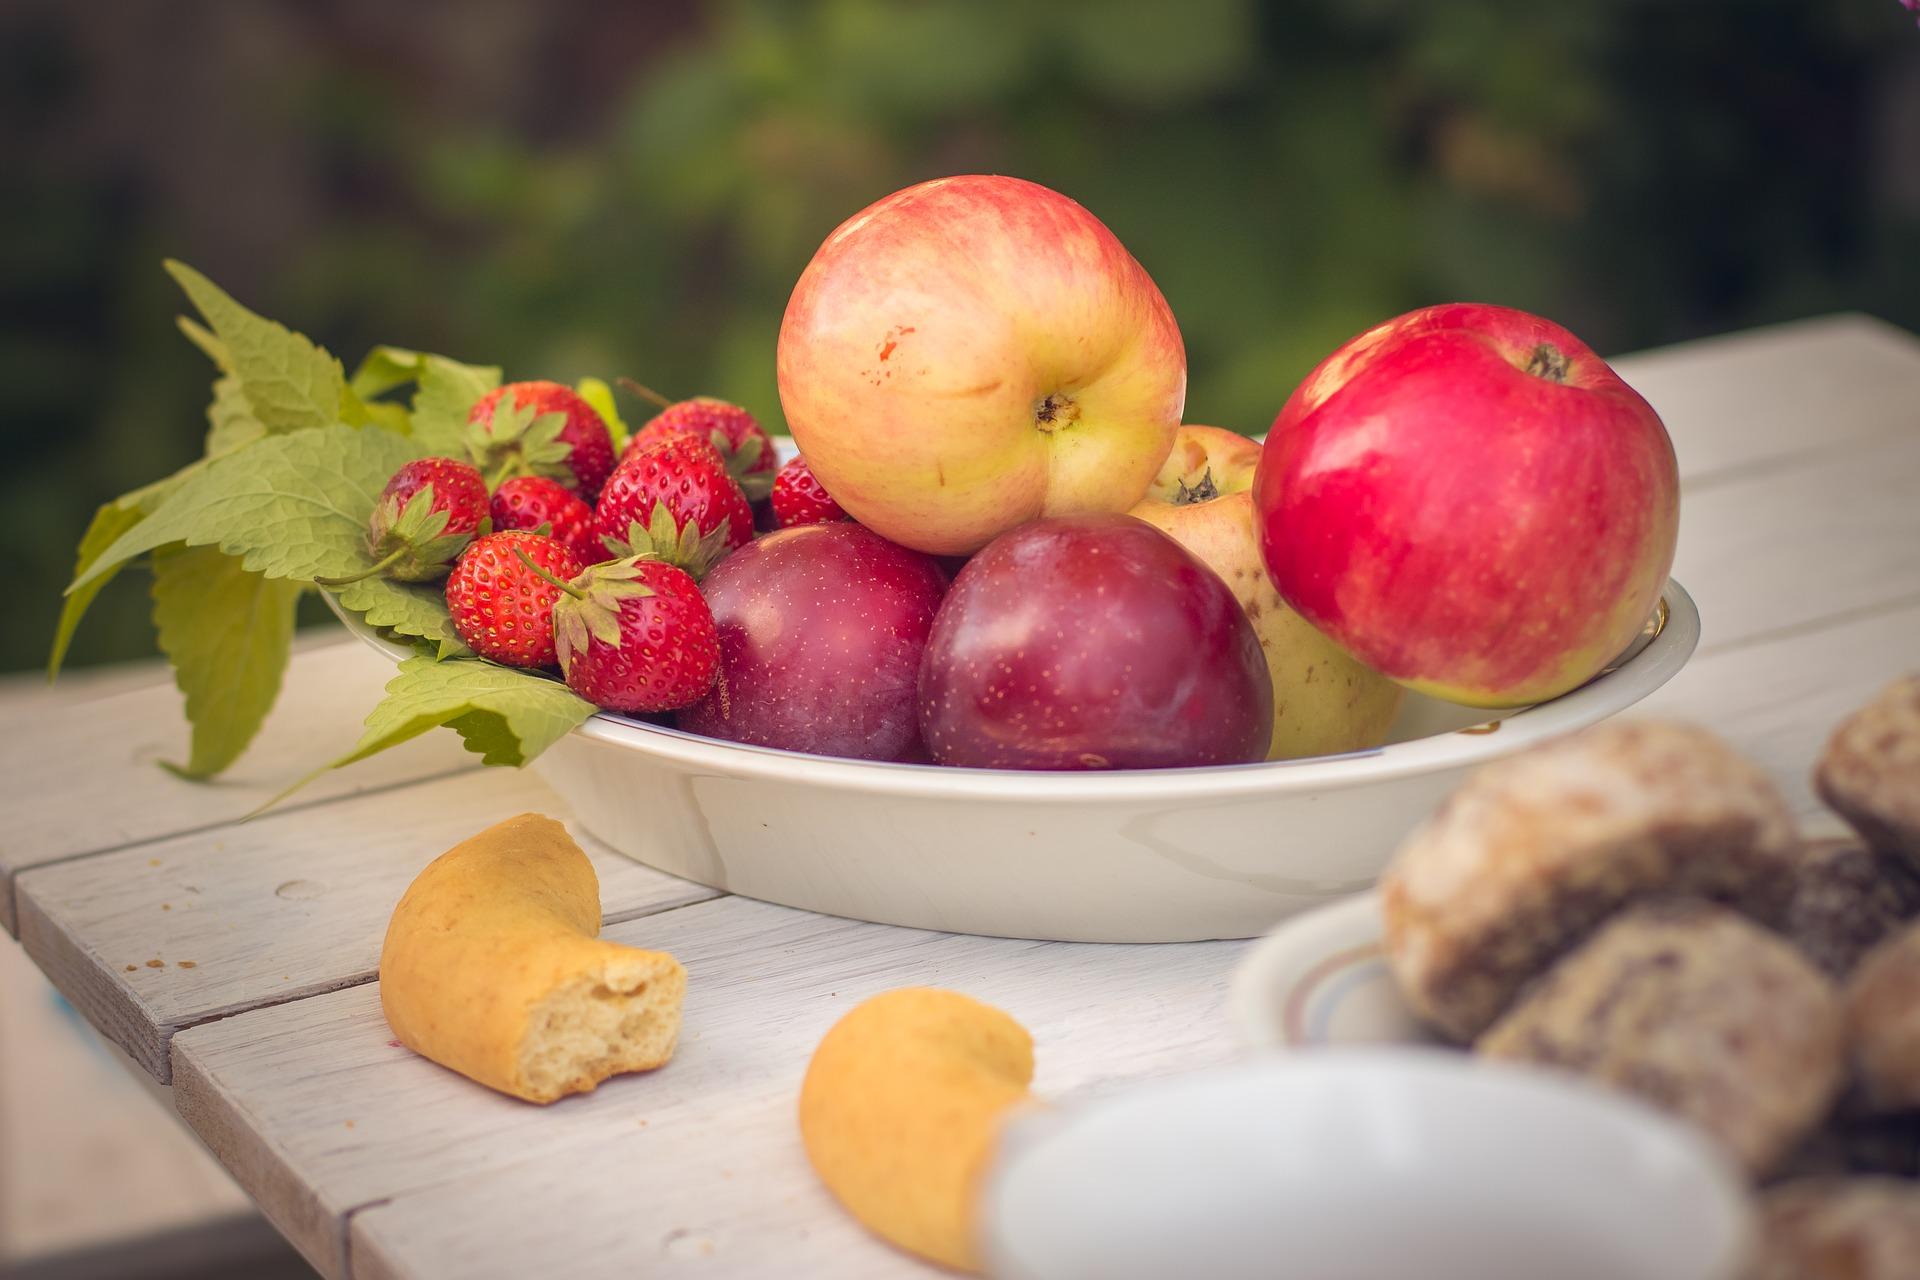 Frittelle di Mele e Prugne in pastella al vino bianco